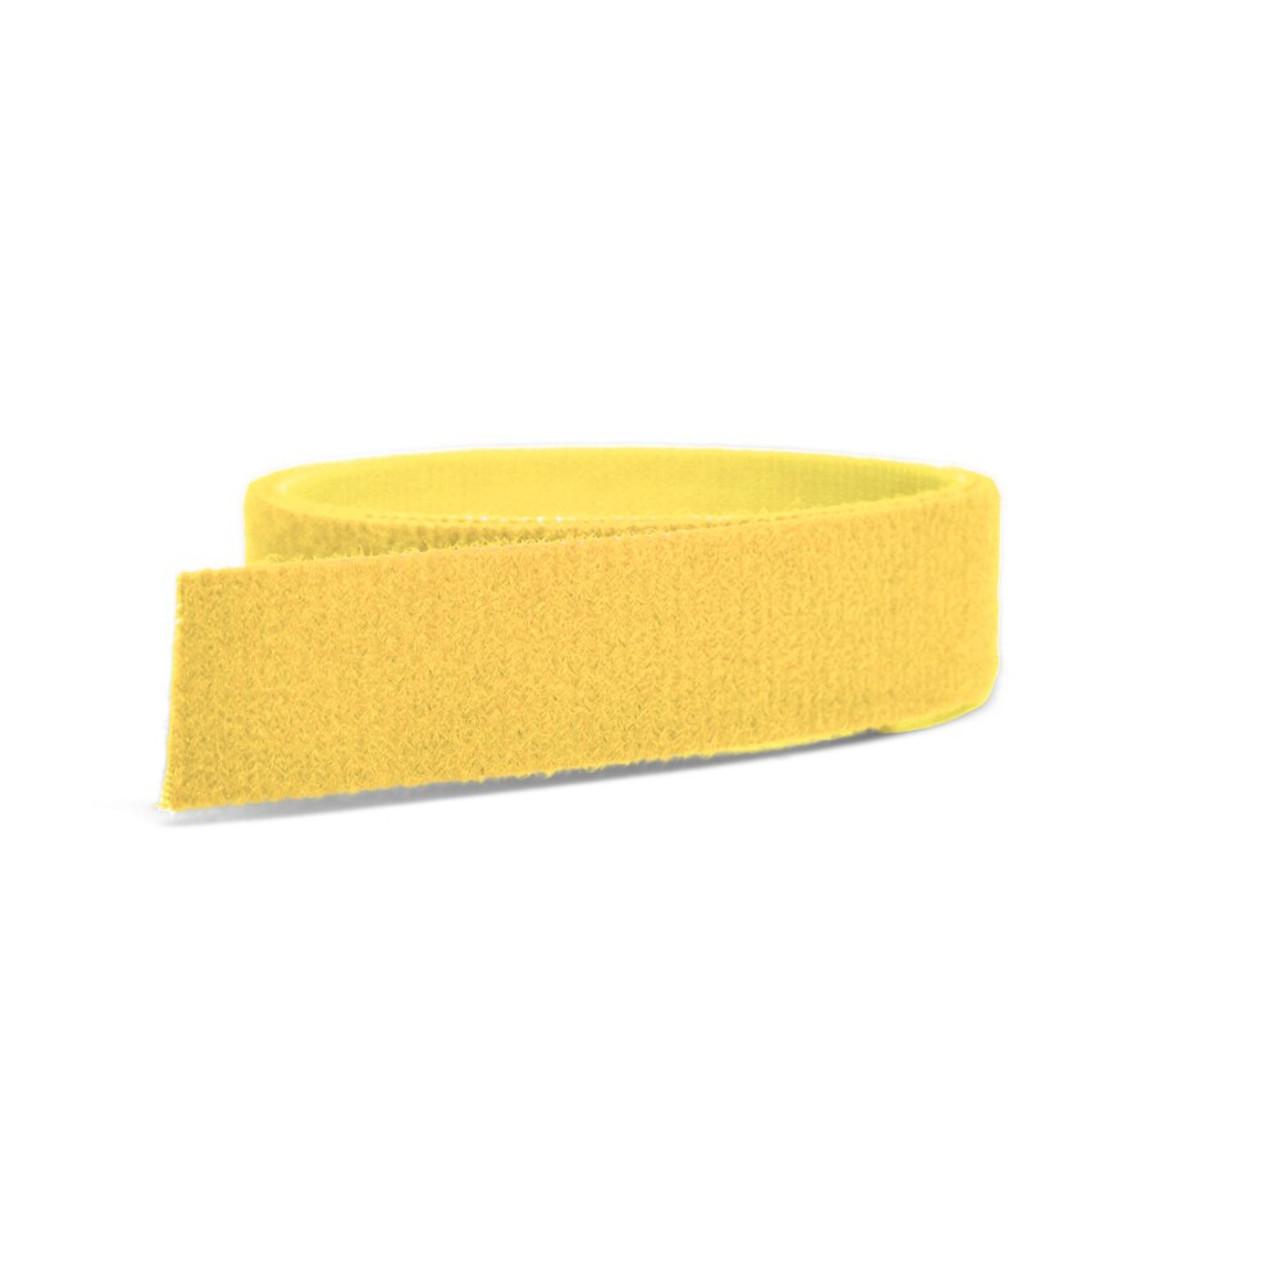 VELCRO® ONE-WRAP® Tape - Yellow / Velcro Straps - Bundling Straps - Velcro Tie - Velcro Strap